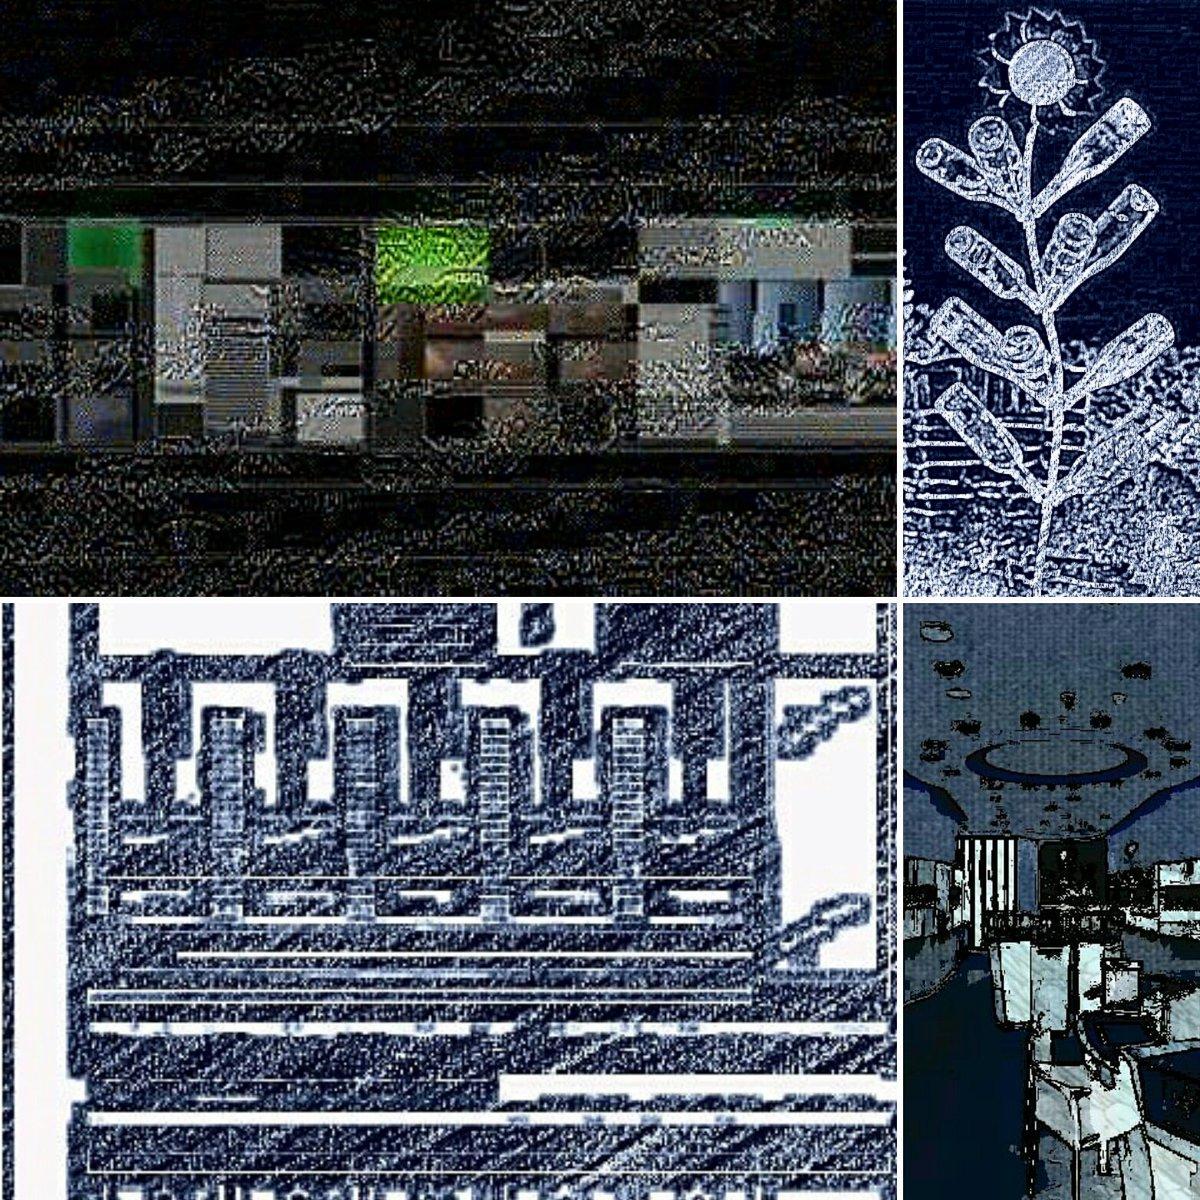 planning and design project in progress August 2018, monorist and proximity trade, retail. Dynamization, planning and design of commercial spaces in progress @GRUPOIMASC @FERNANDO J.H.ORTIZ #Arquitecturainterior #ESPACIOSOCIO #DiseñoDeInteriores #diseñointeriorExtremeño.<br>http://pic.twitter.com/QaKmXdCibu